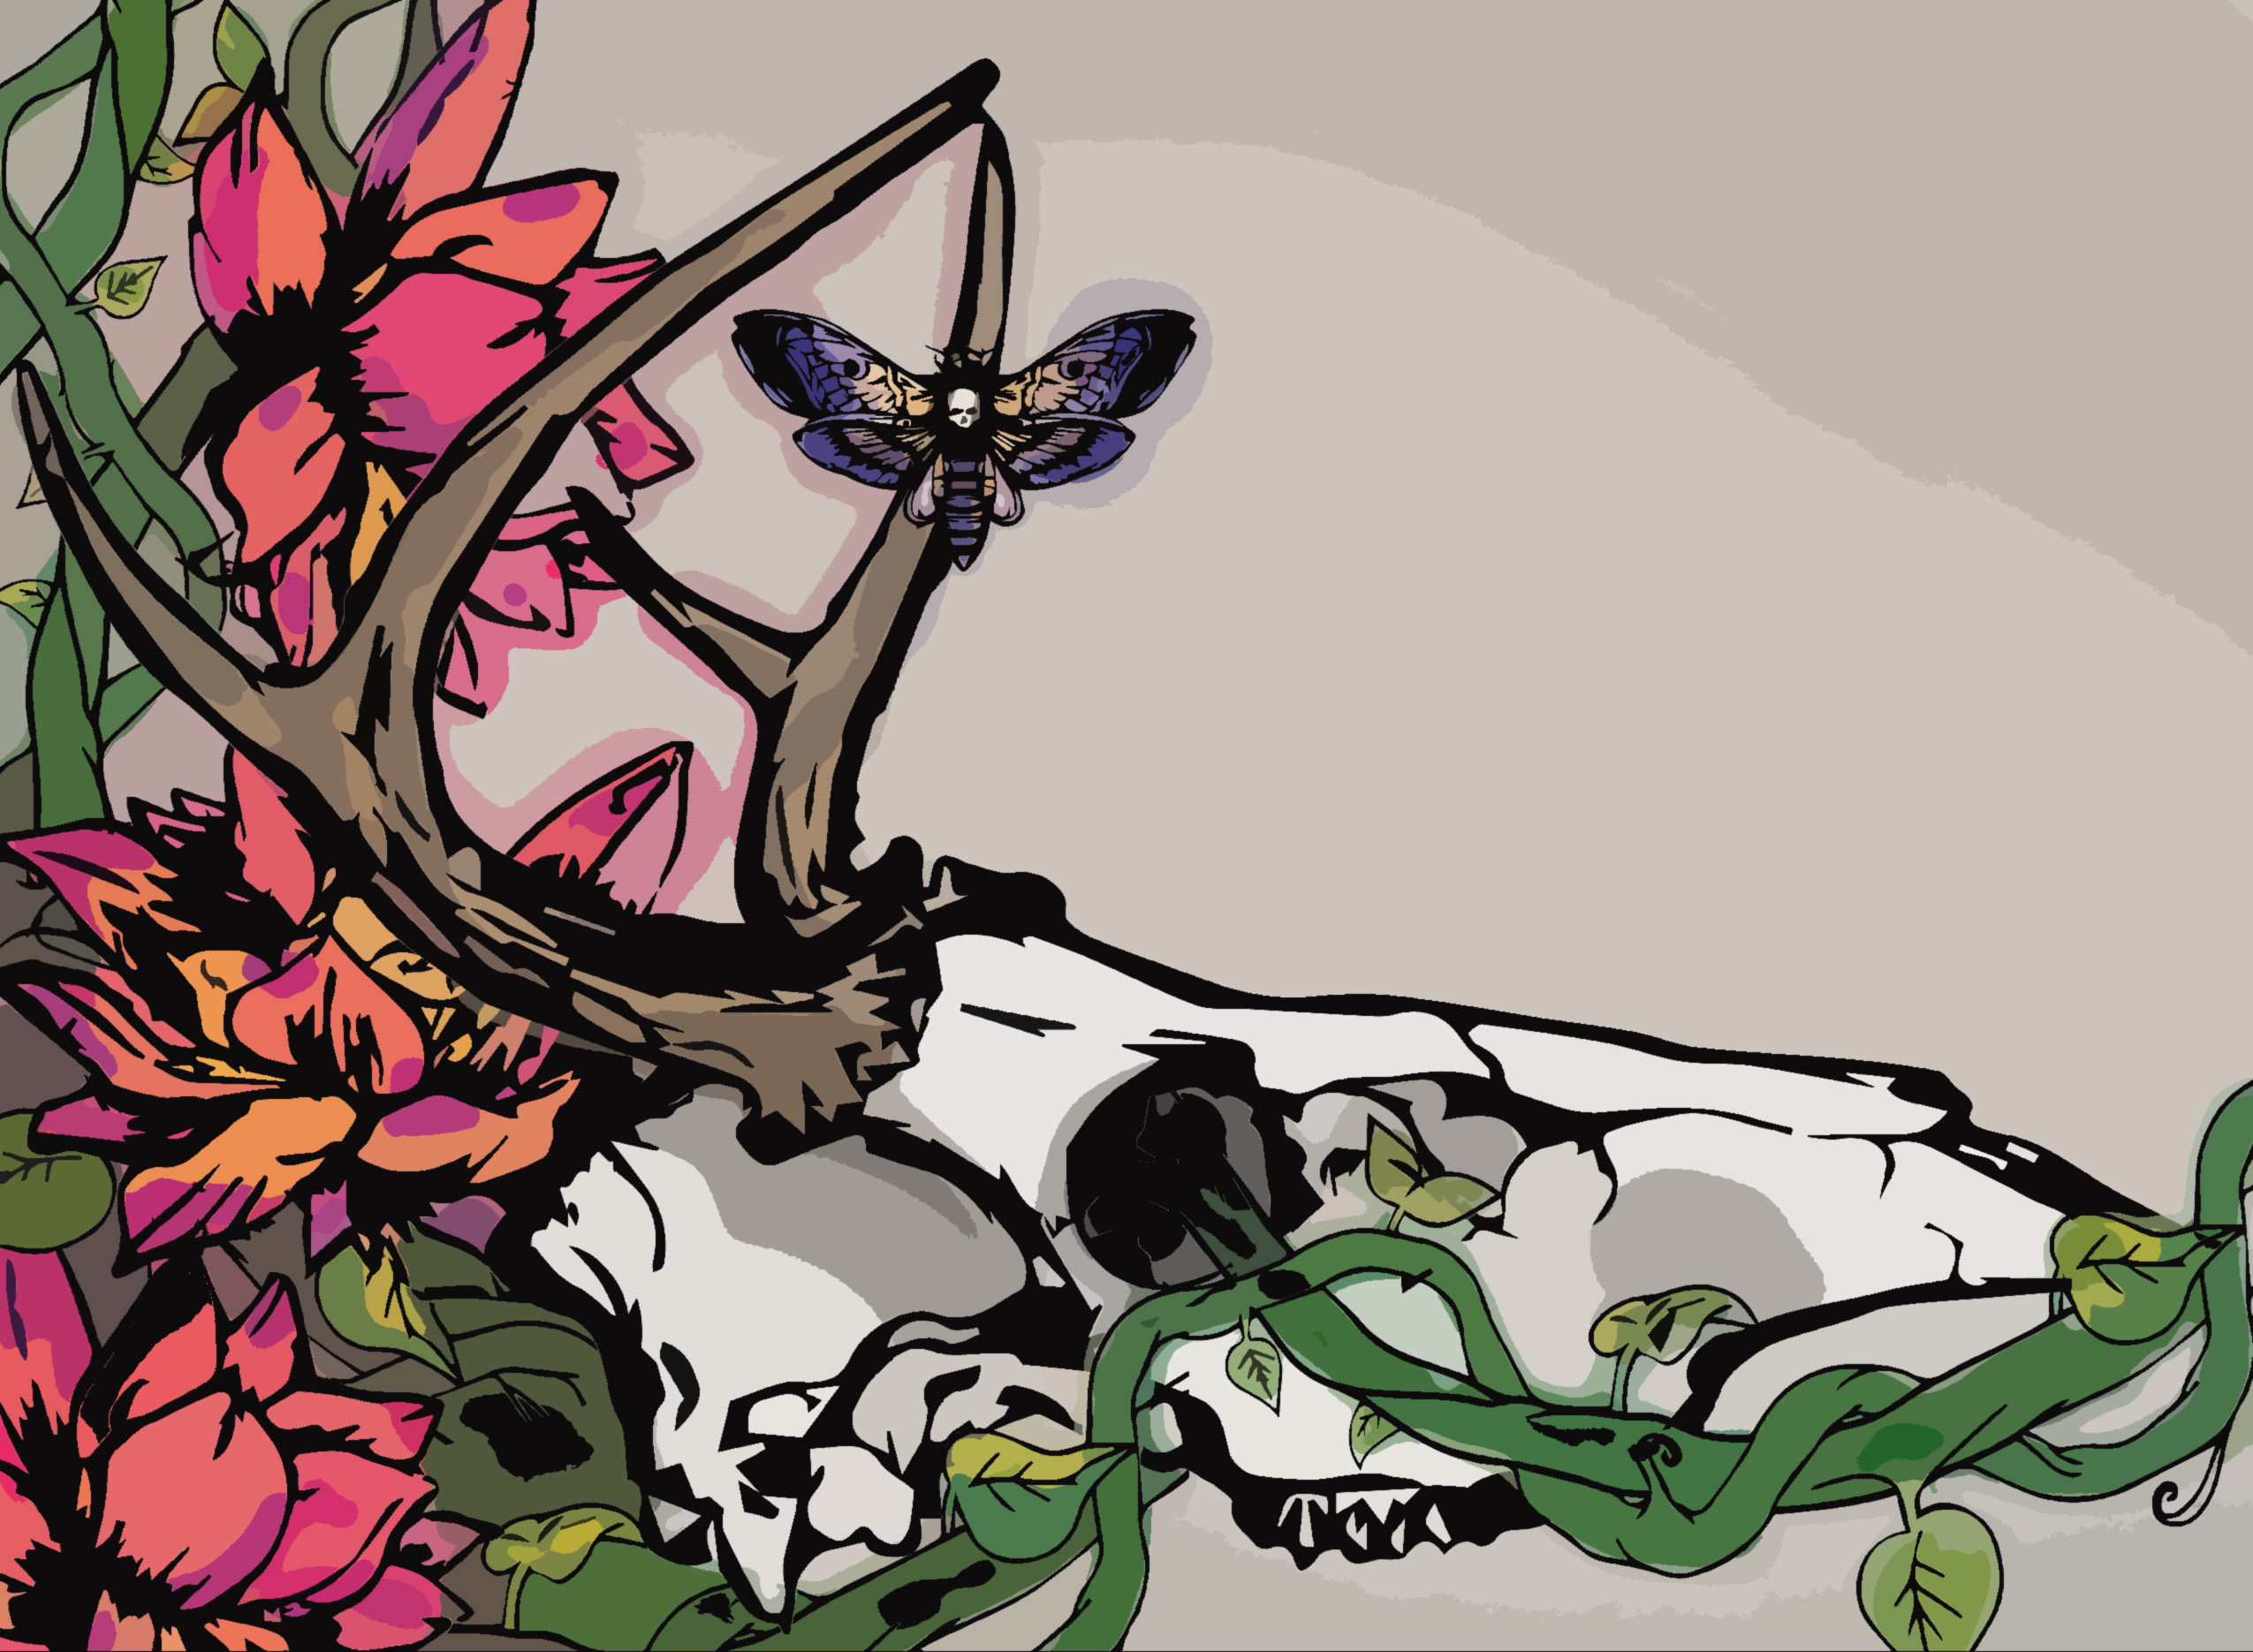 Noctuidae on Behance.